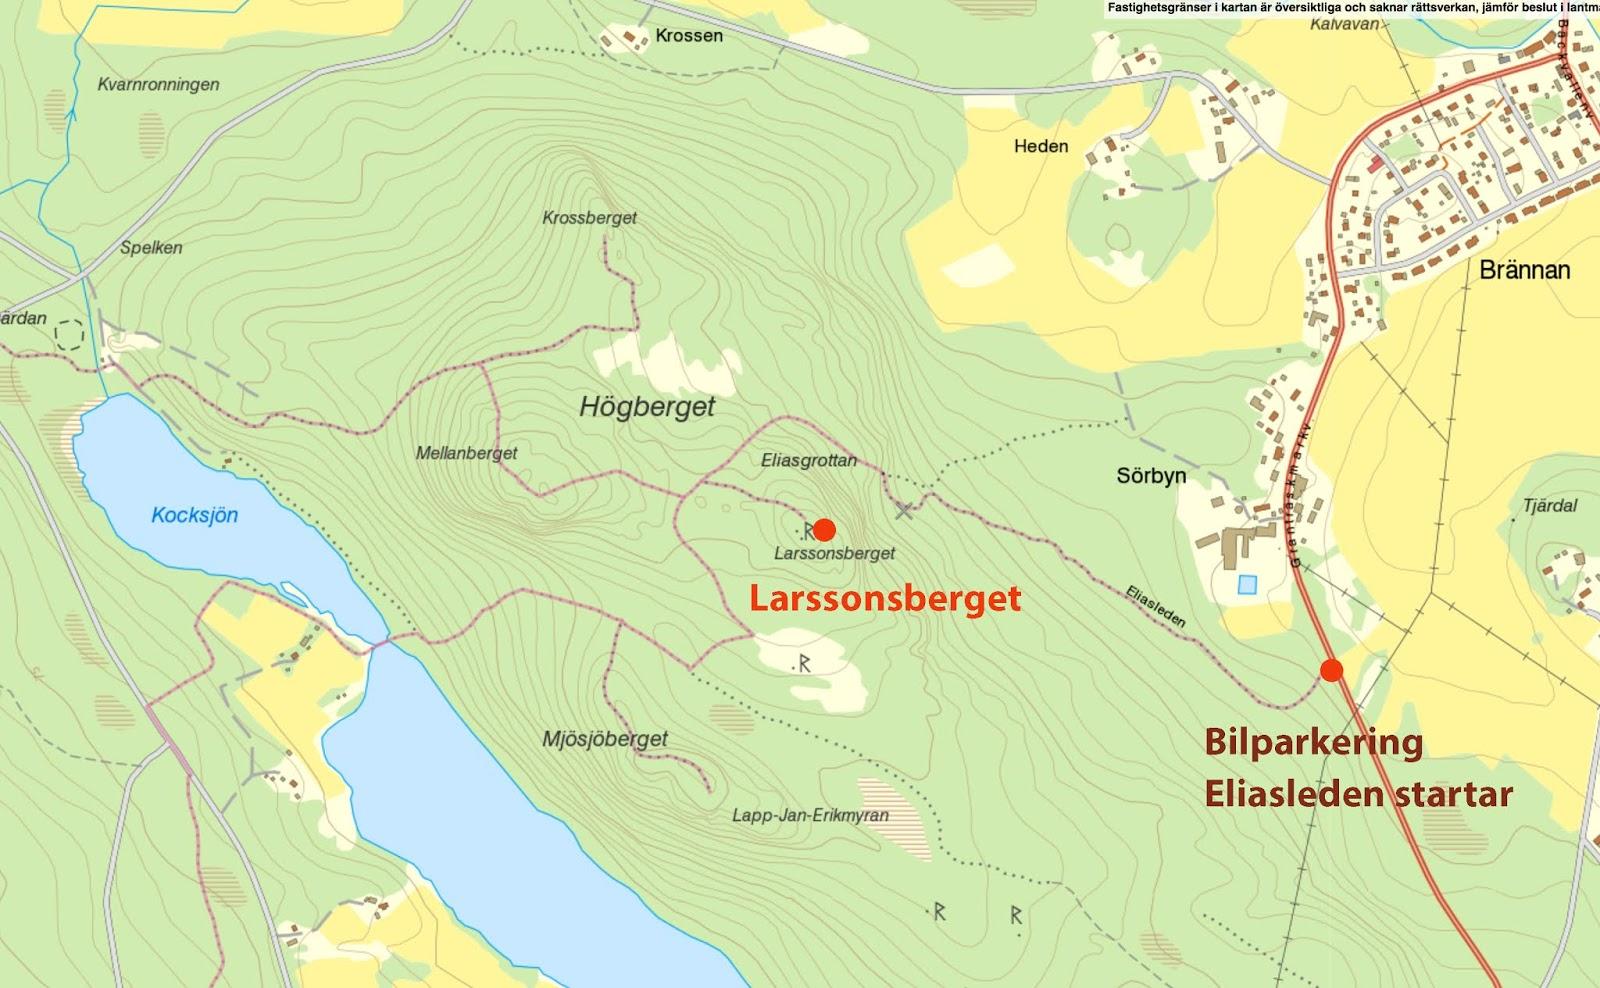 eliasleden karta Top of Piteå eliasleden karta